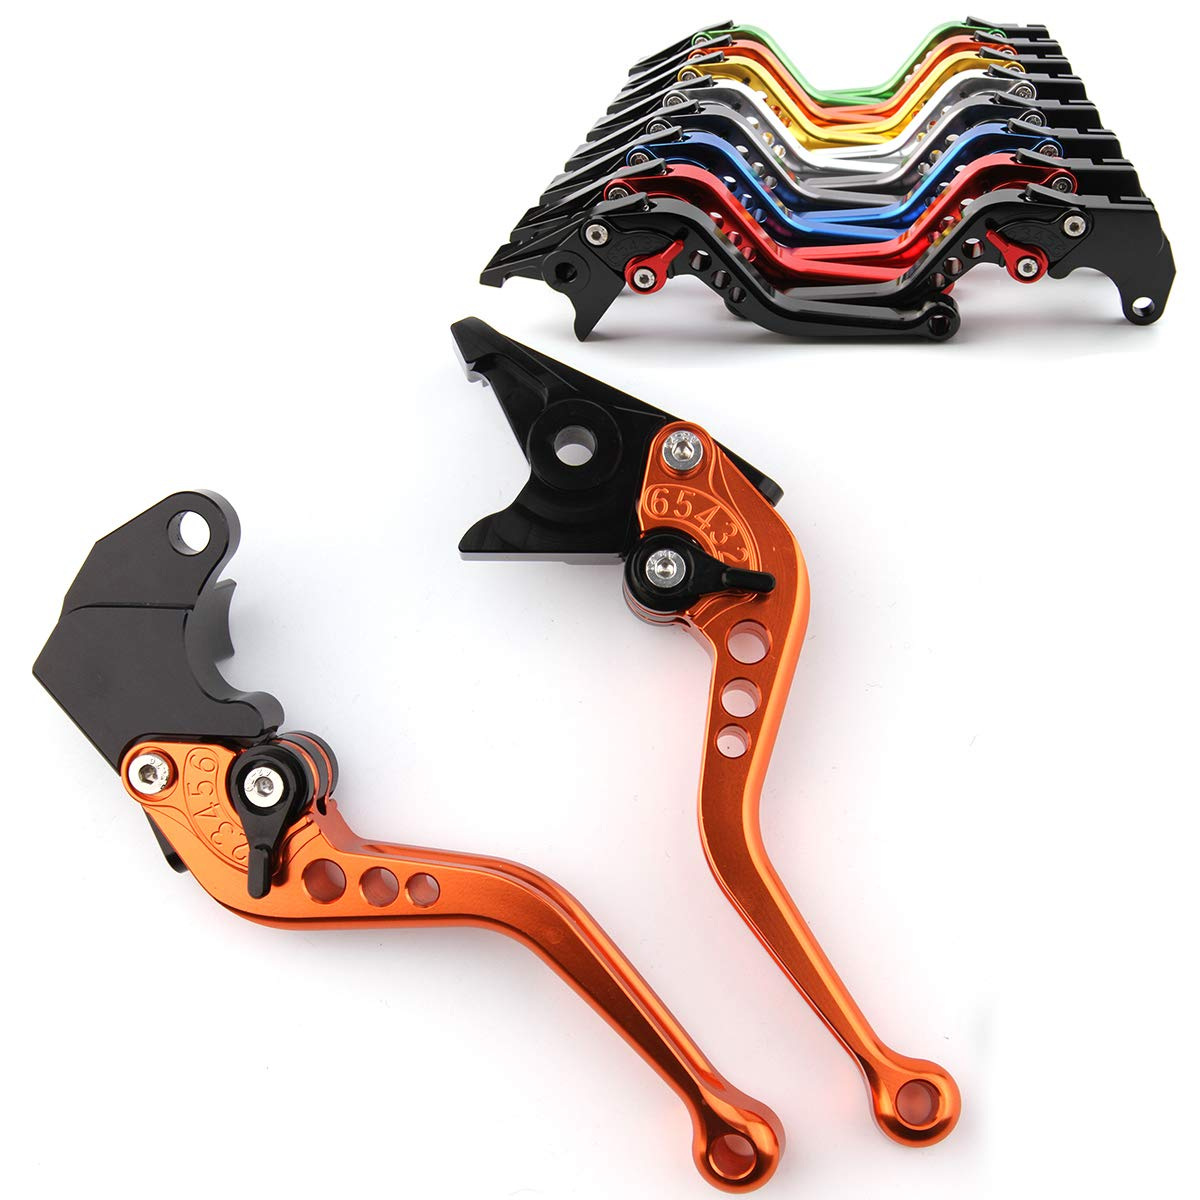 MFS MOTOR Adjustable CNC Short Brake Clutch Levers for Honda CBR600RR 2003-2006 CBR954RR 2002-2003